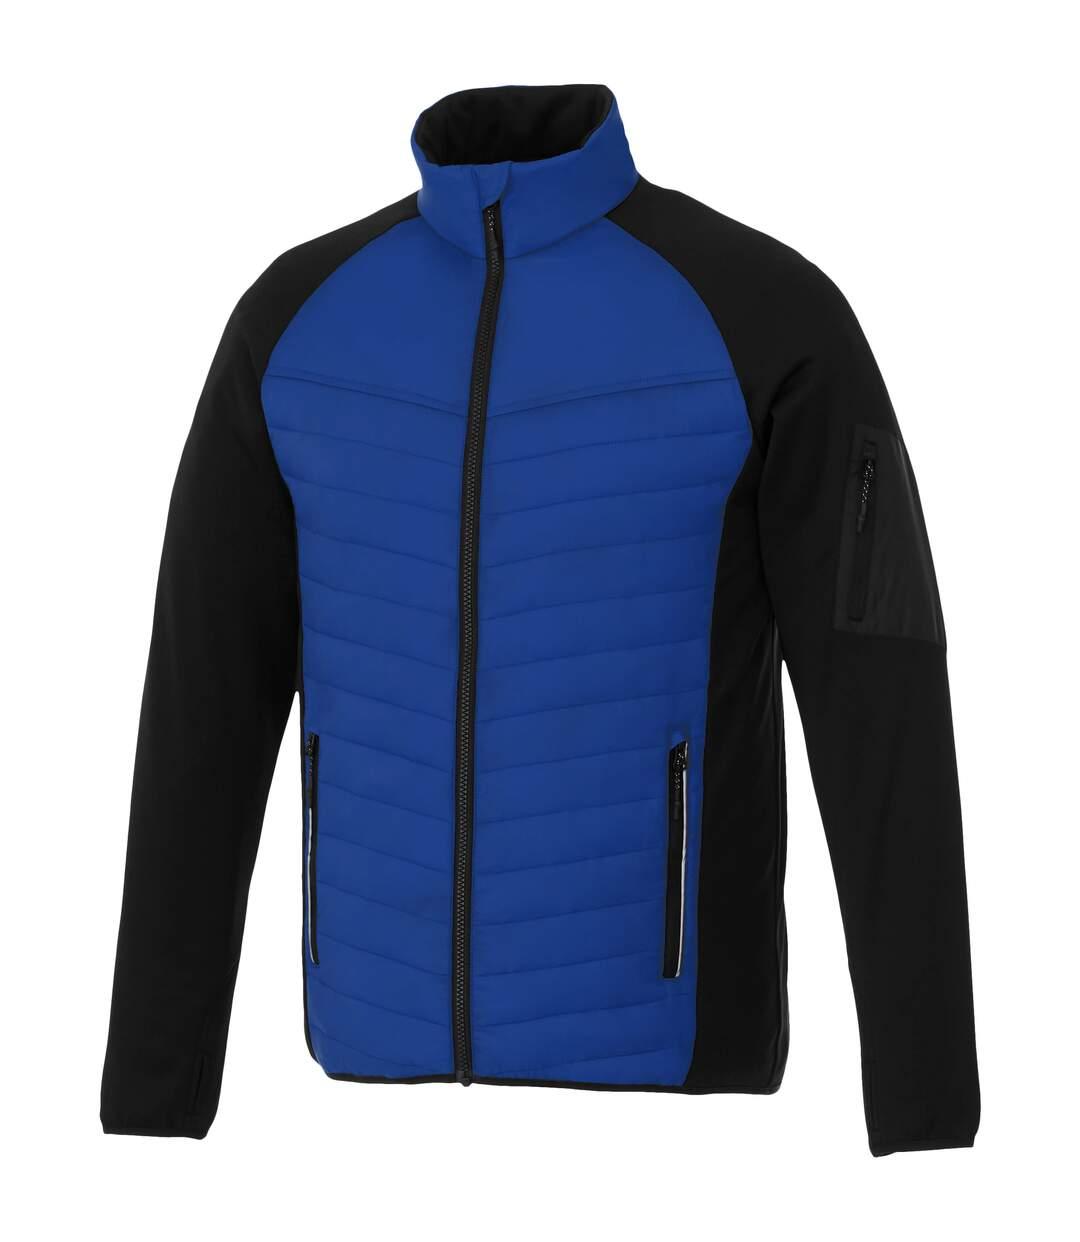 Elevate Mens Banff Hybrid Insulated Jacket (Blue) - UTPF1926